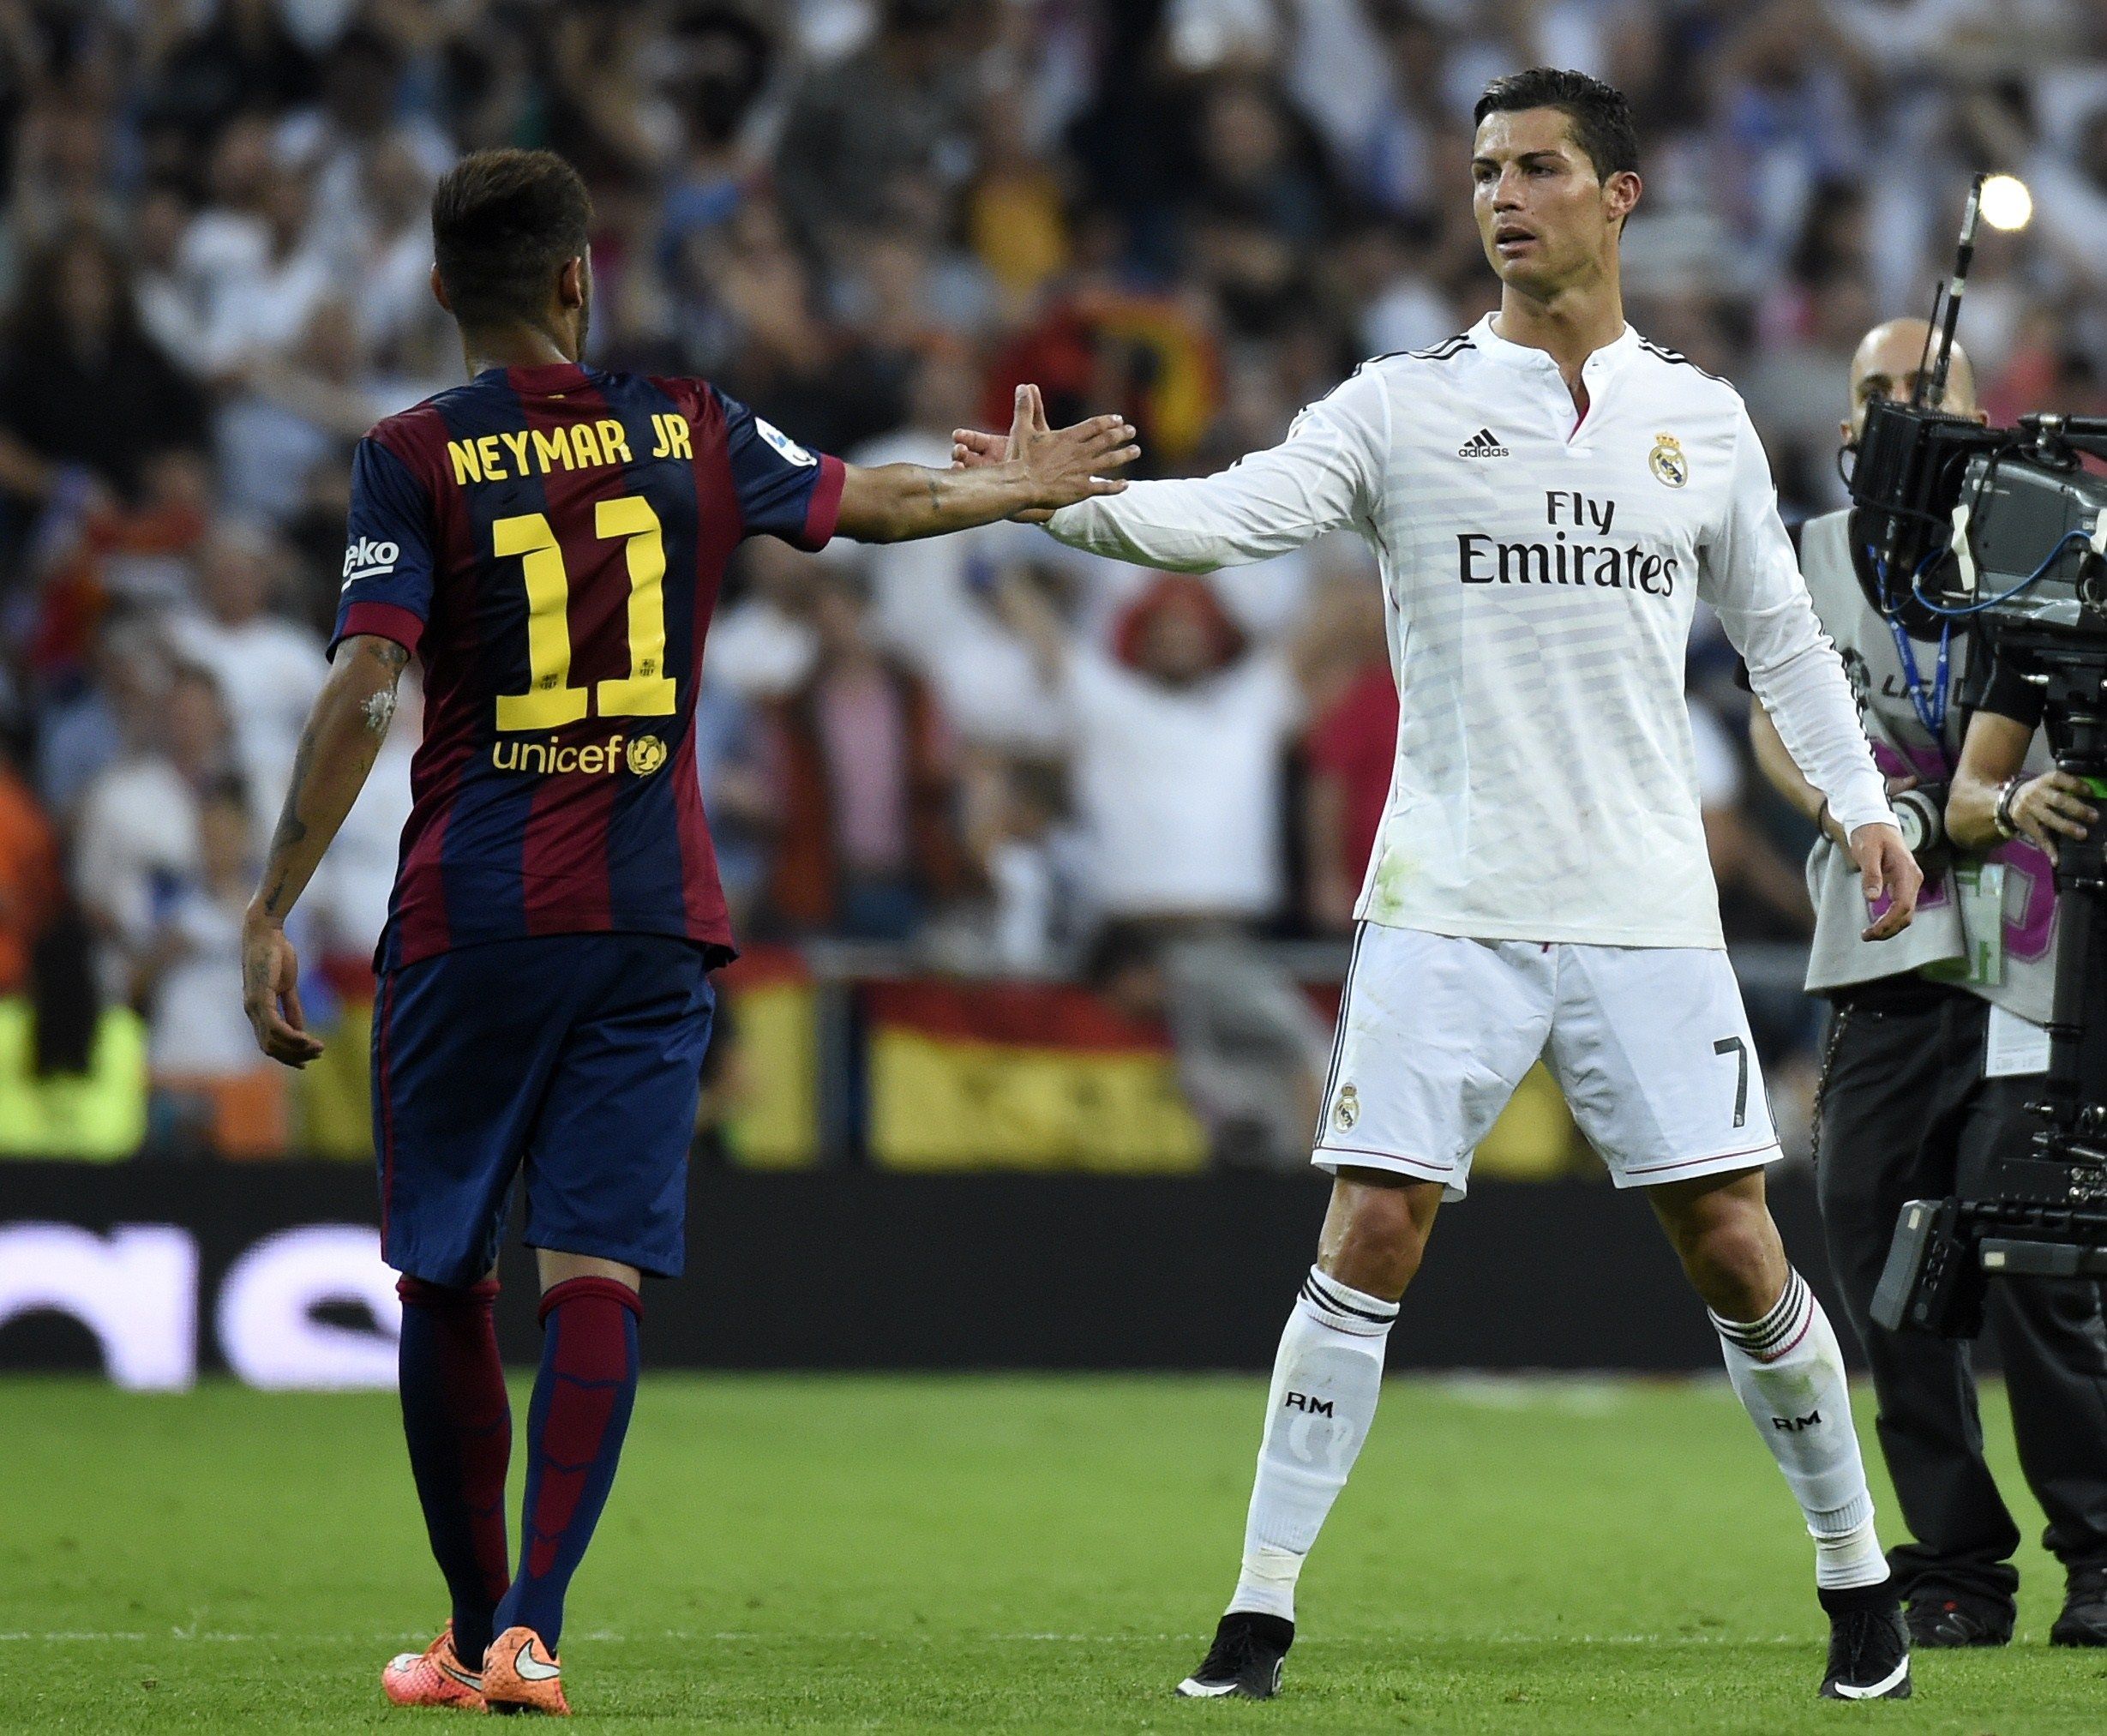 Neymar Left With Cristiano Ronaldo